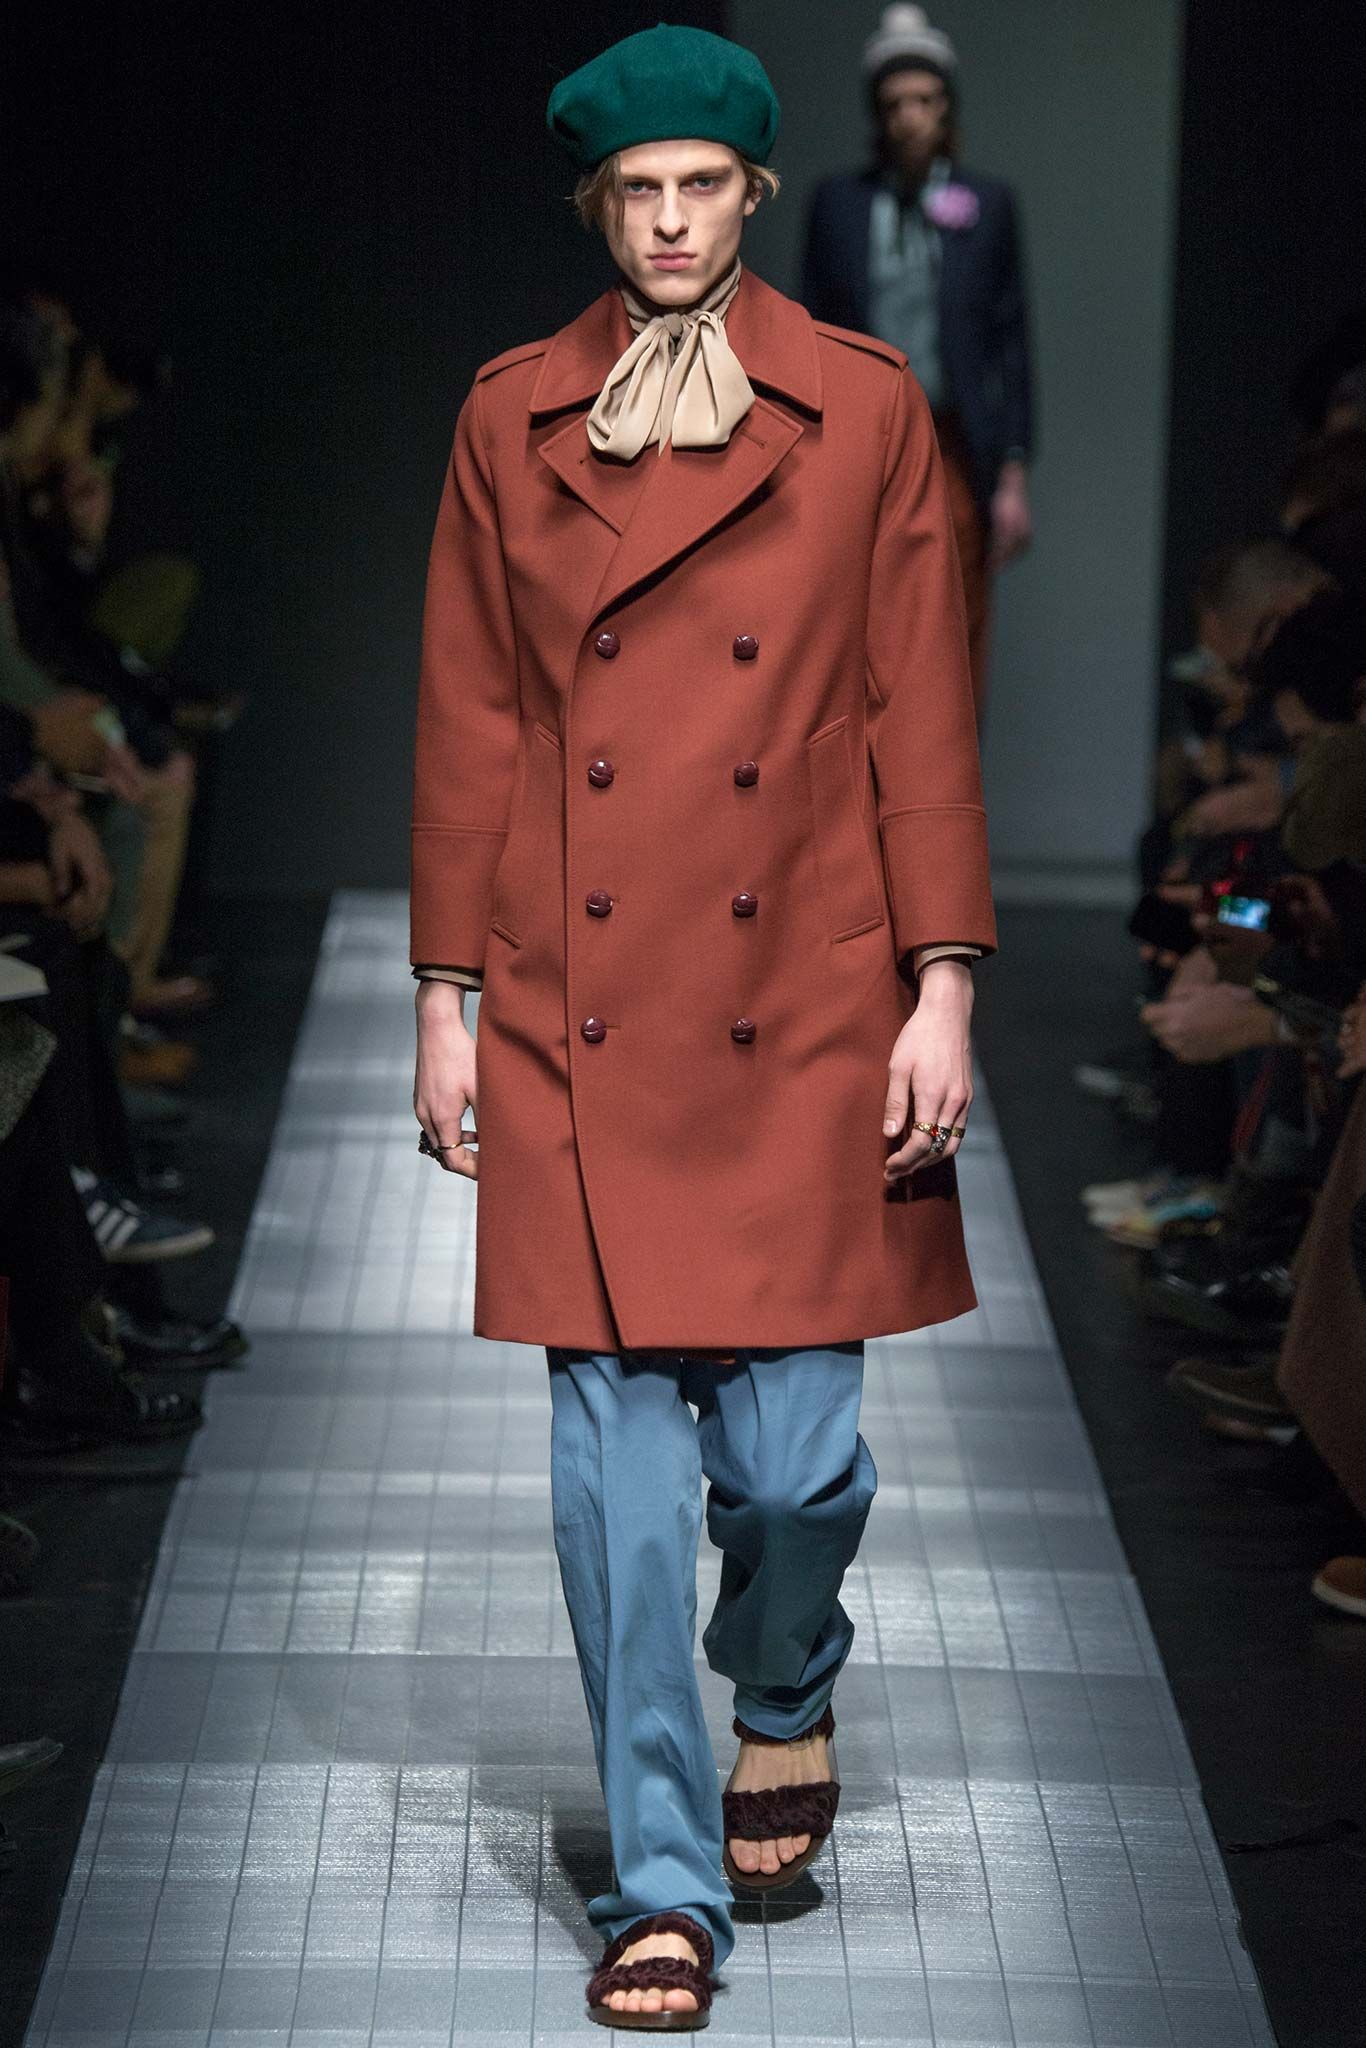 Gucci - Fall 2015 Menswear - Look 7 of 37 #MFW